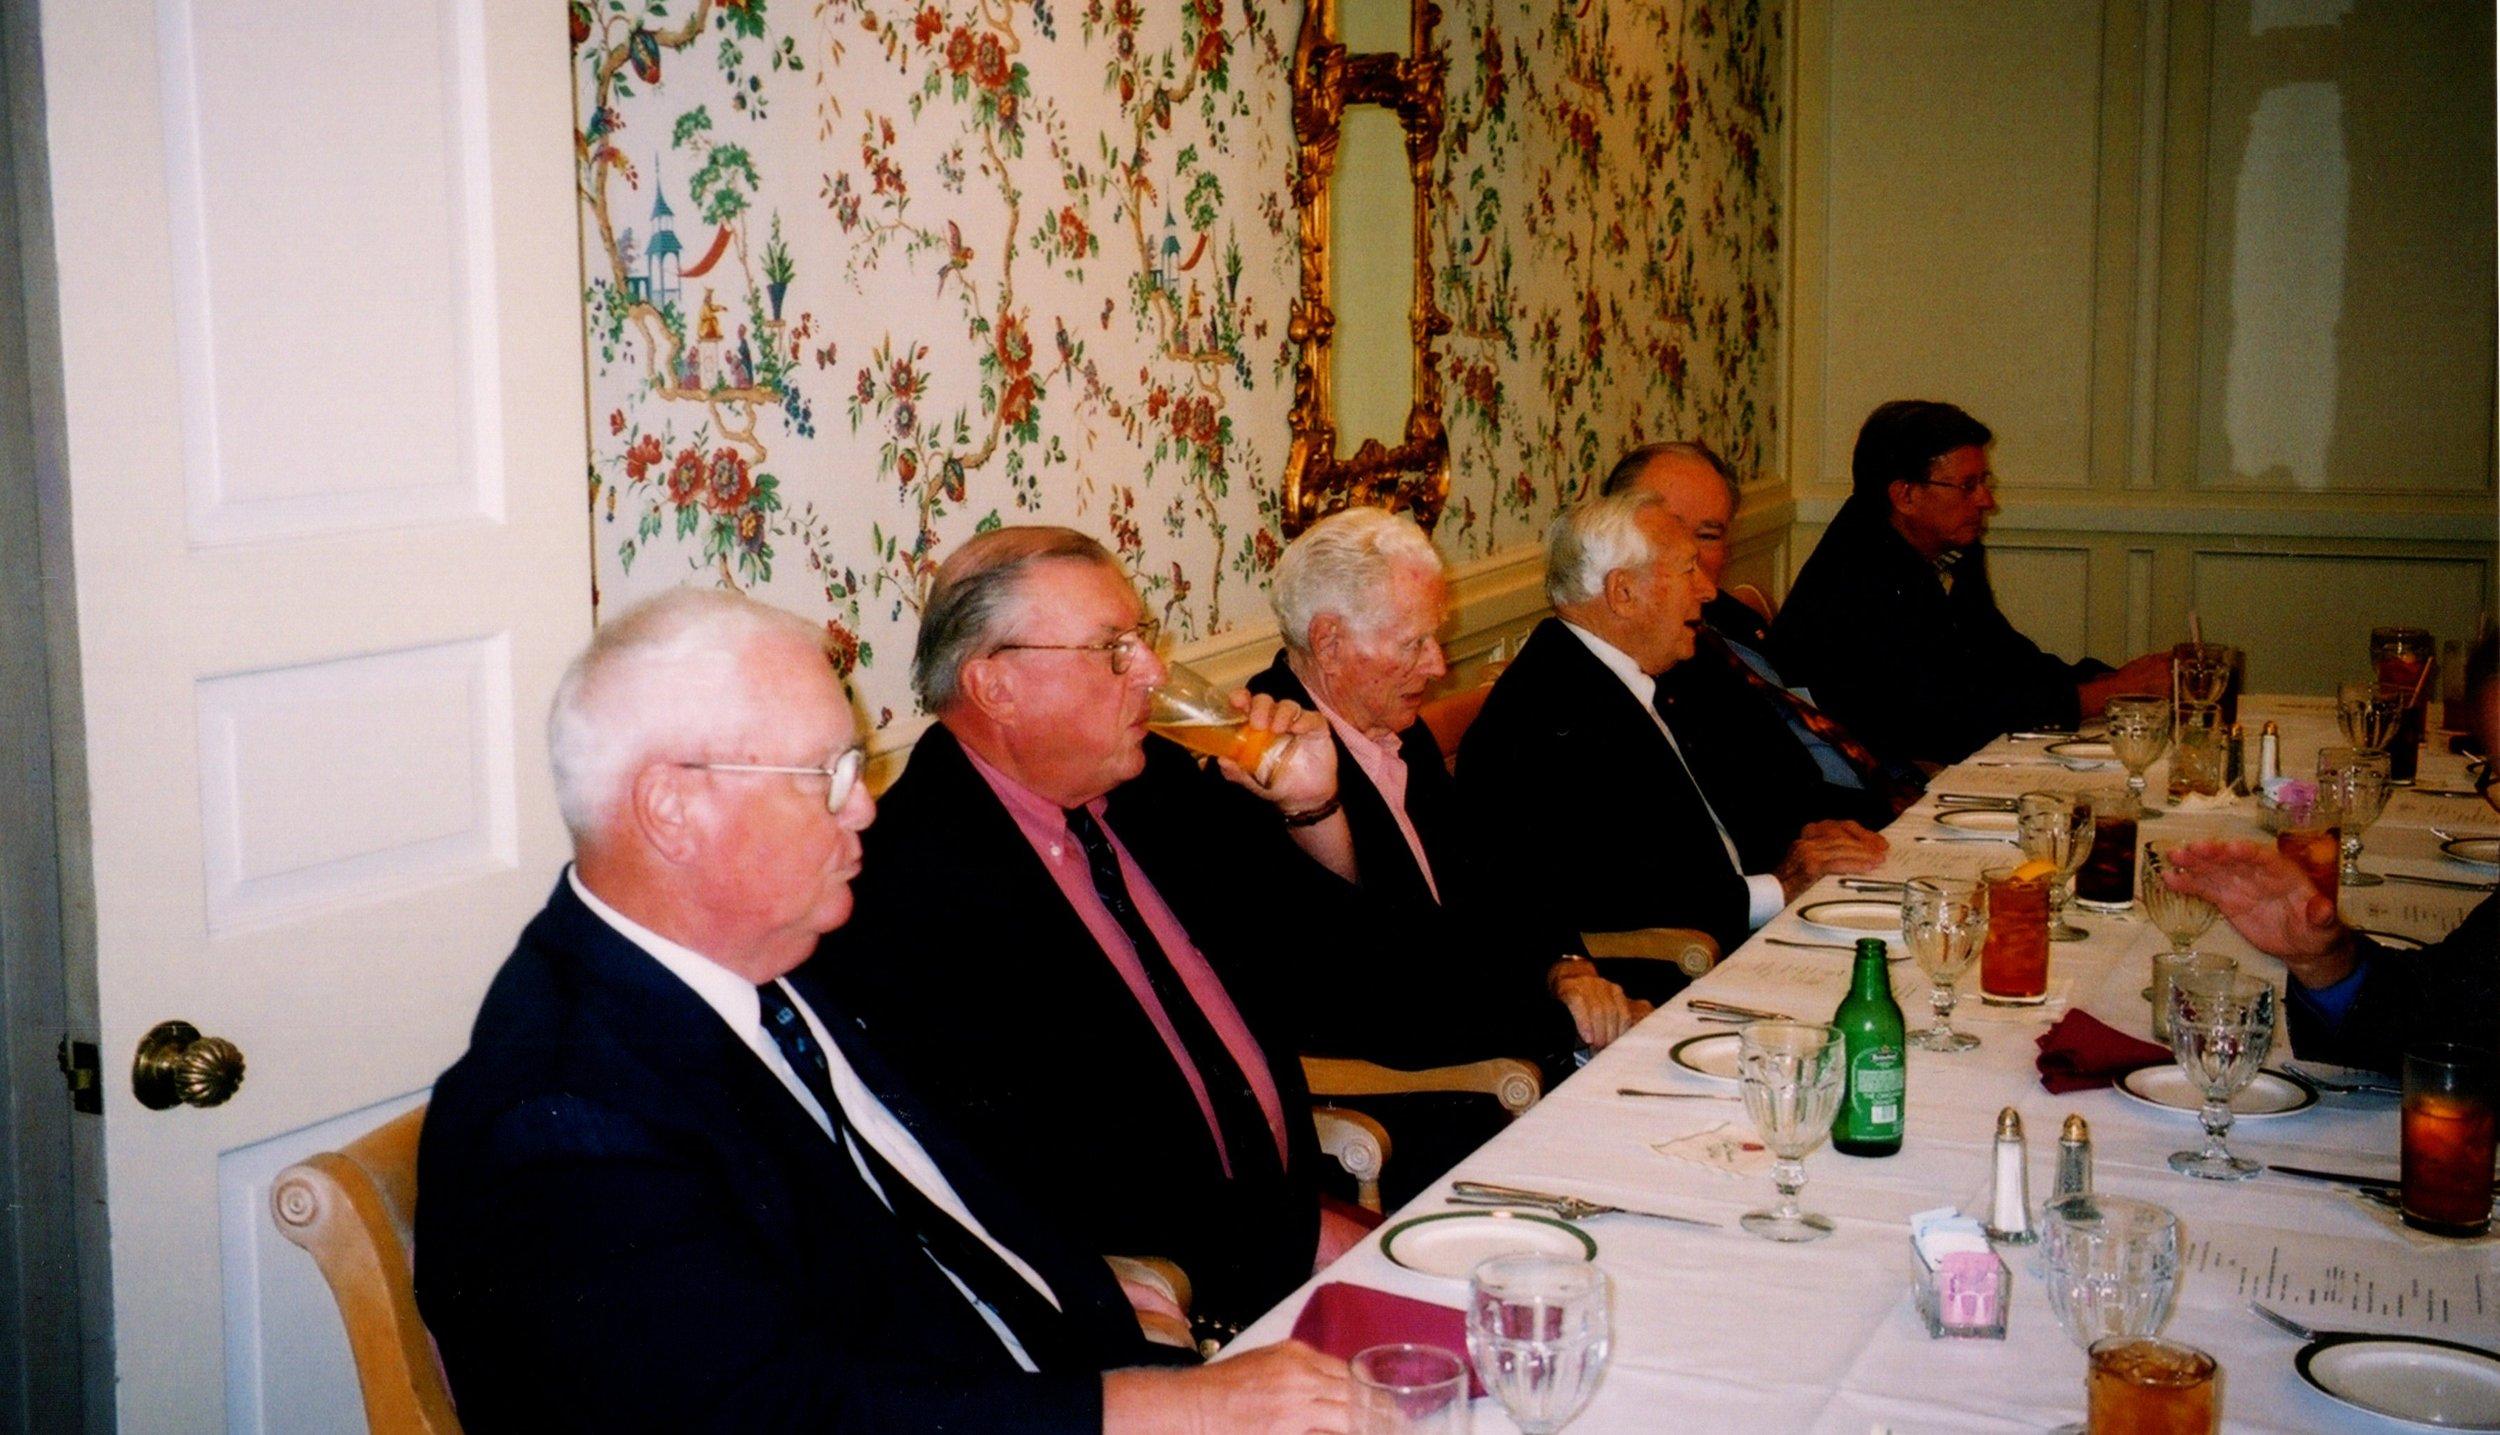 1_15_2000 - ANNUAL MEETING OF MEMBERS - ROYAL POINCIANA GOLF CLUB5.jpg